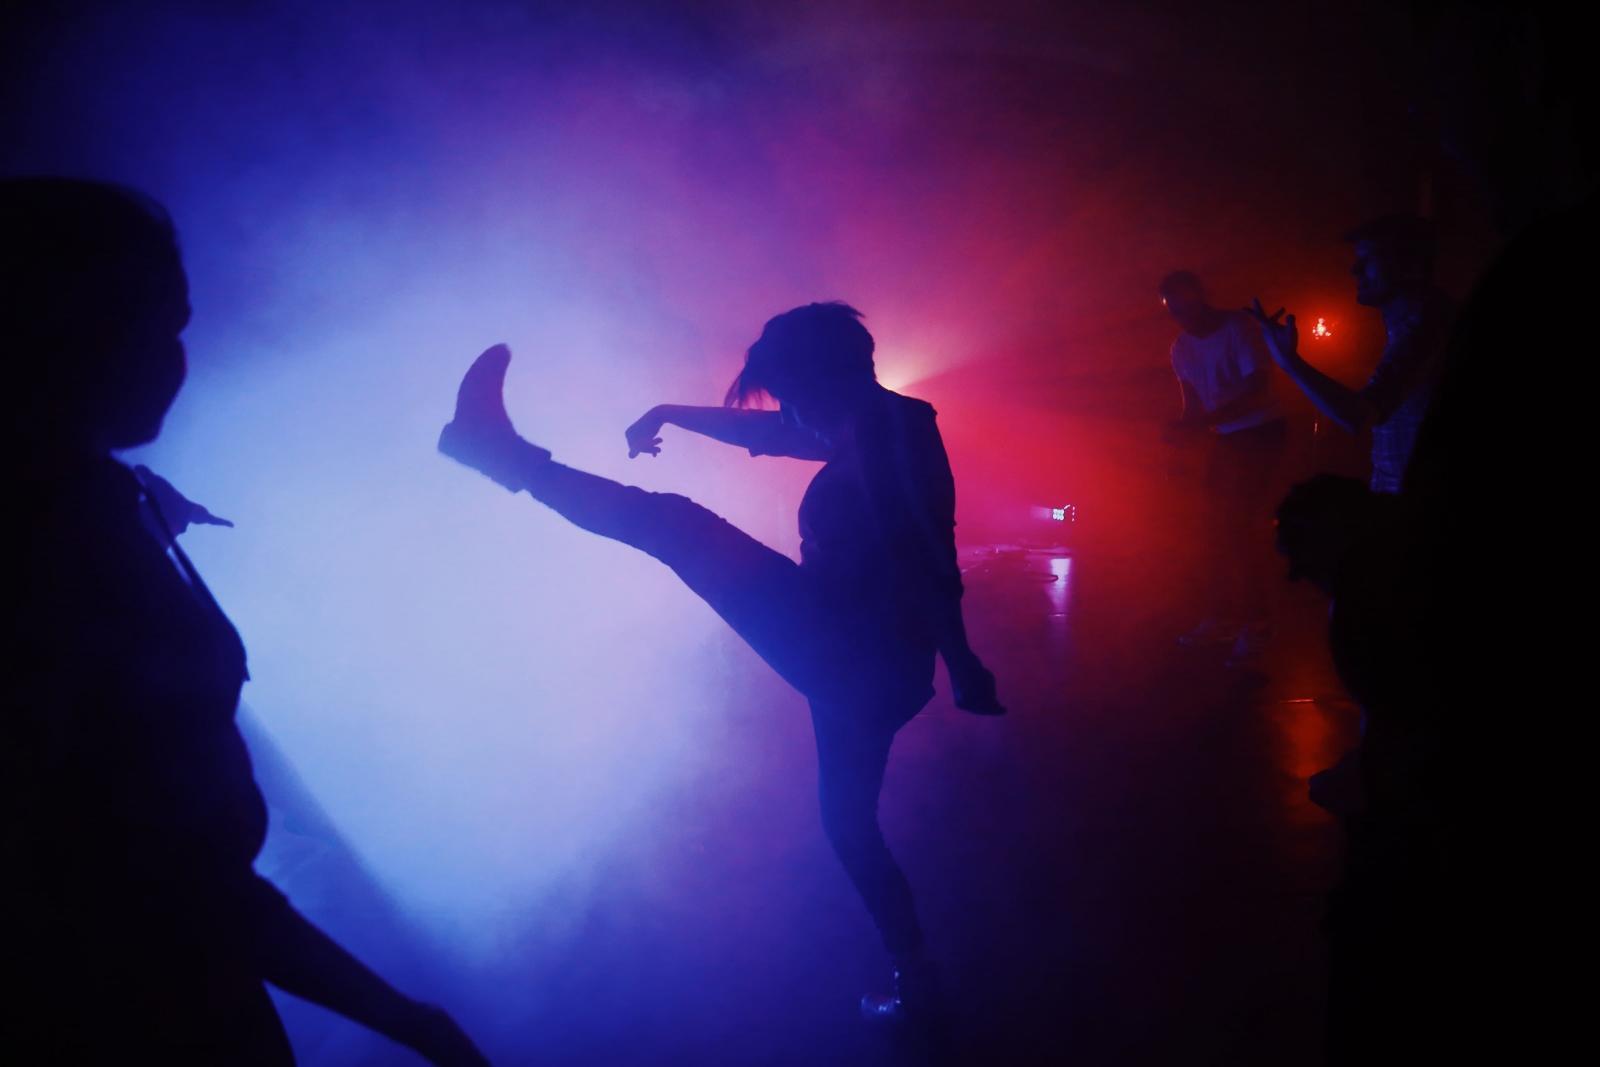 Kimmernaq Kjeldsen dances at the Disko Arts afterparty in Ilulissat after the final performance. Photo by Jessie Brinkman Evans